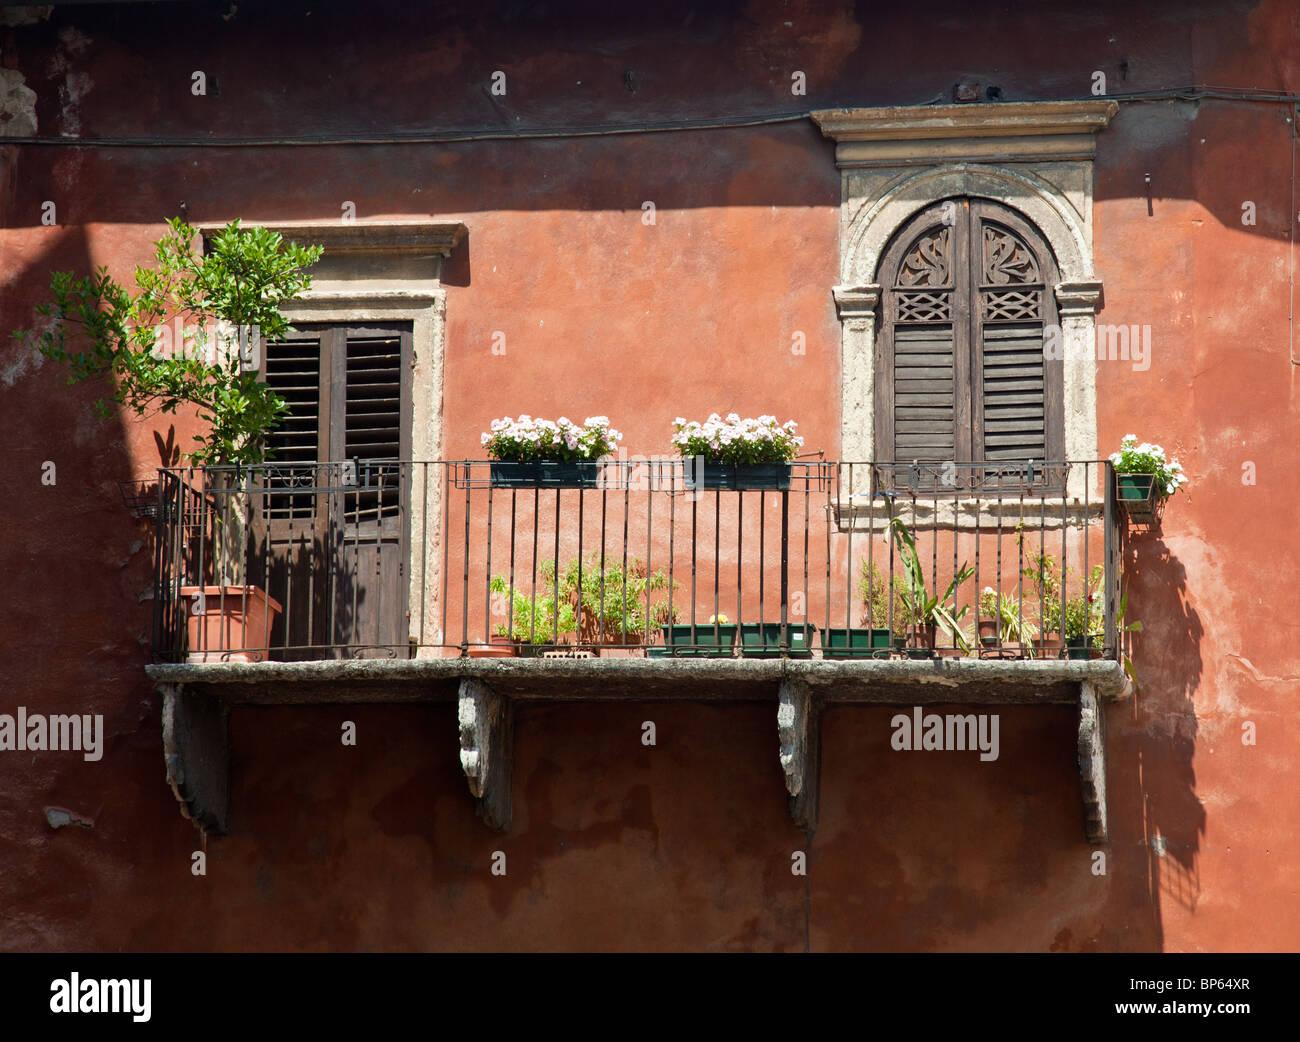 Alten Balkon auf ein Haus in Verona, Italien Stockbild